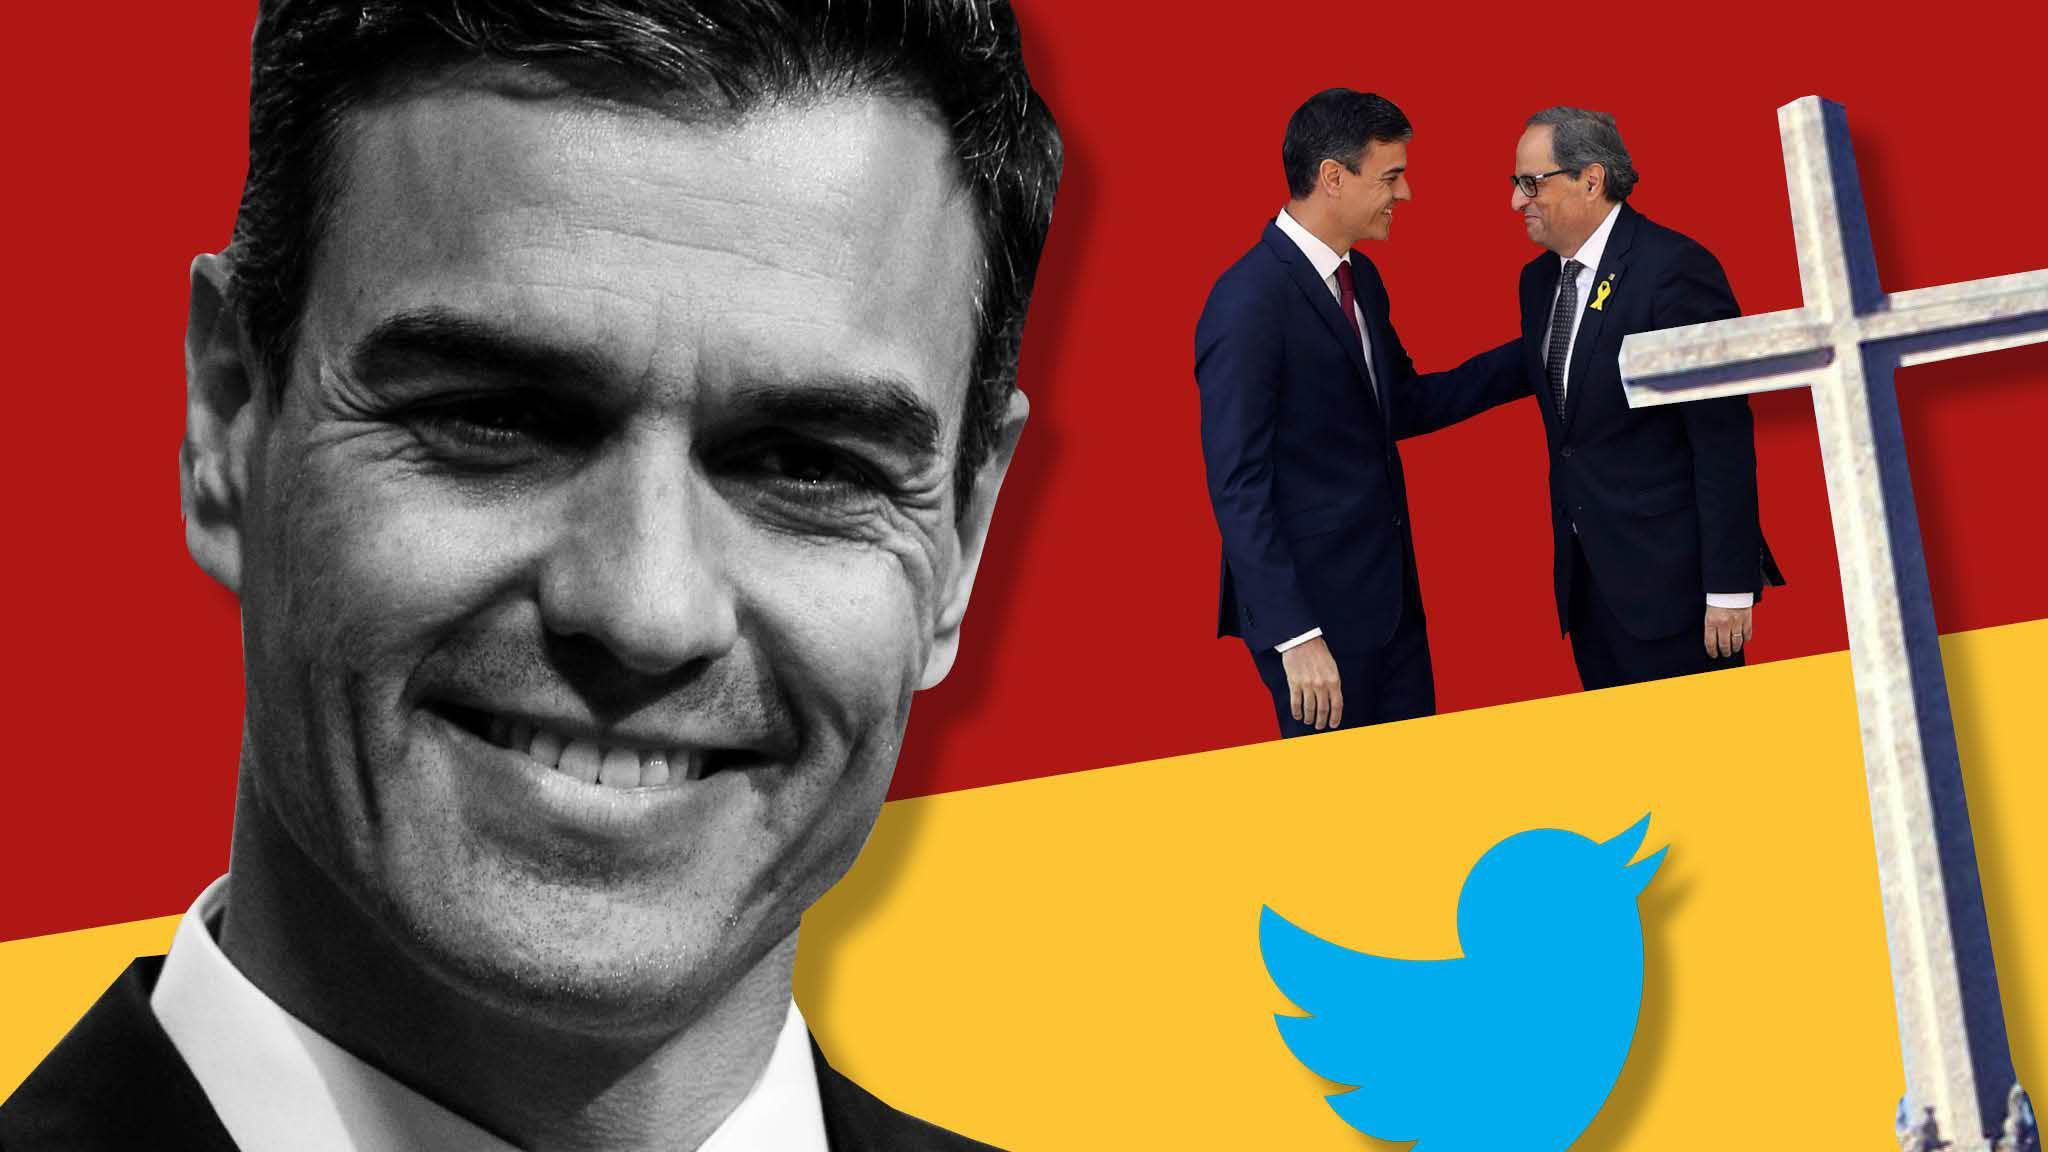 Sánchez enjoys Spanish honeymoon after rise to power